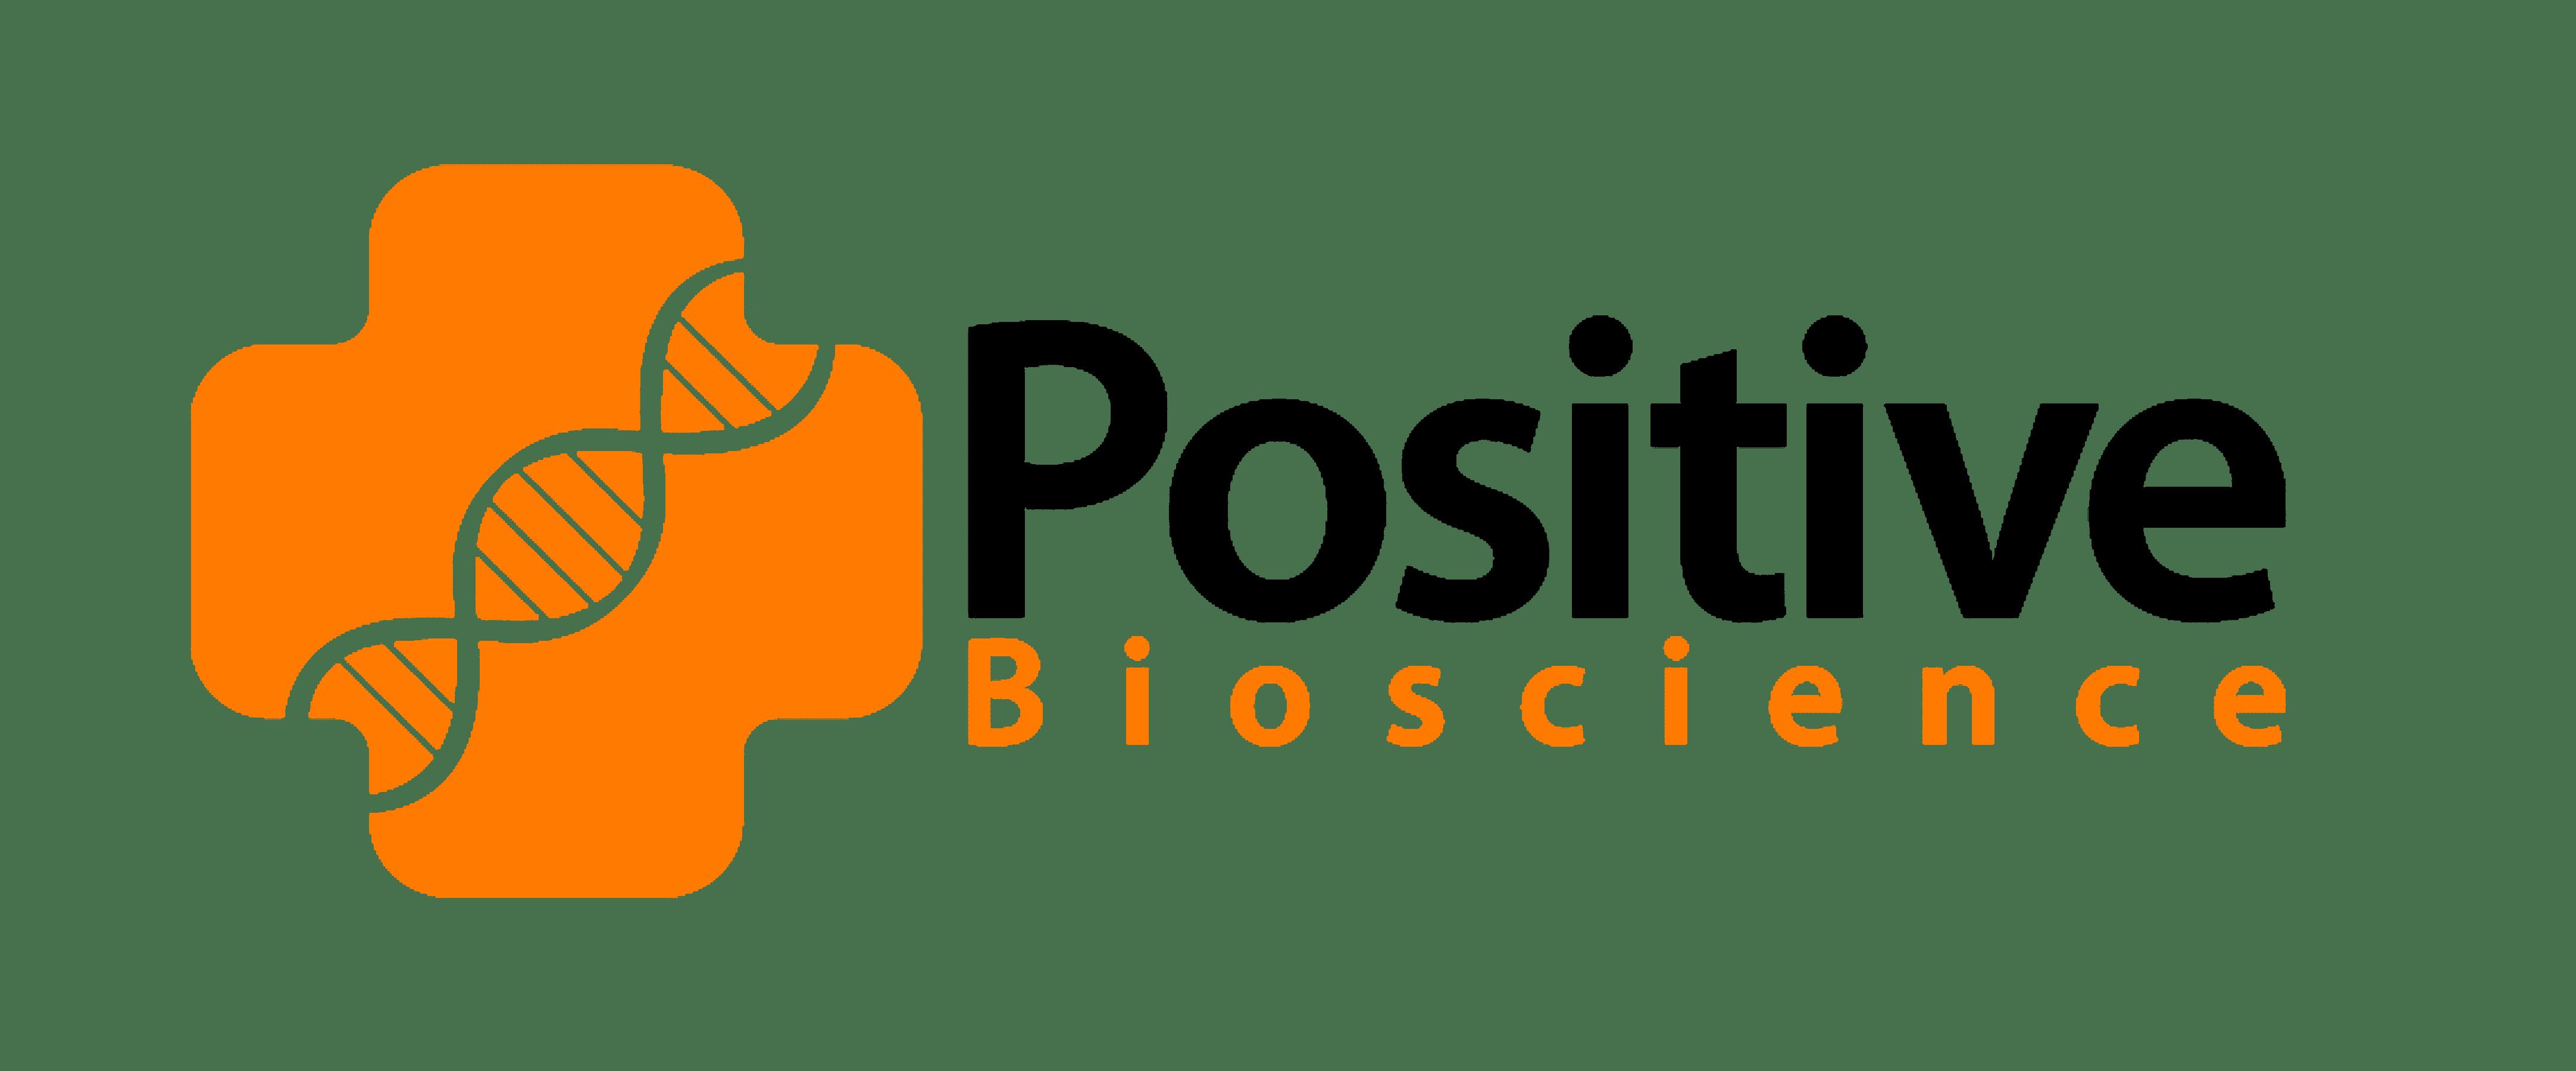 Positive Bioscience India